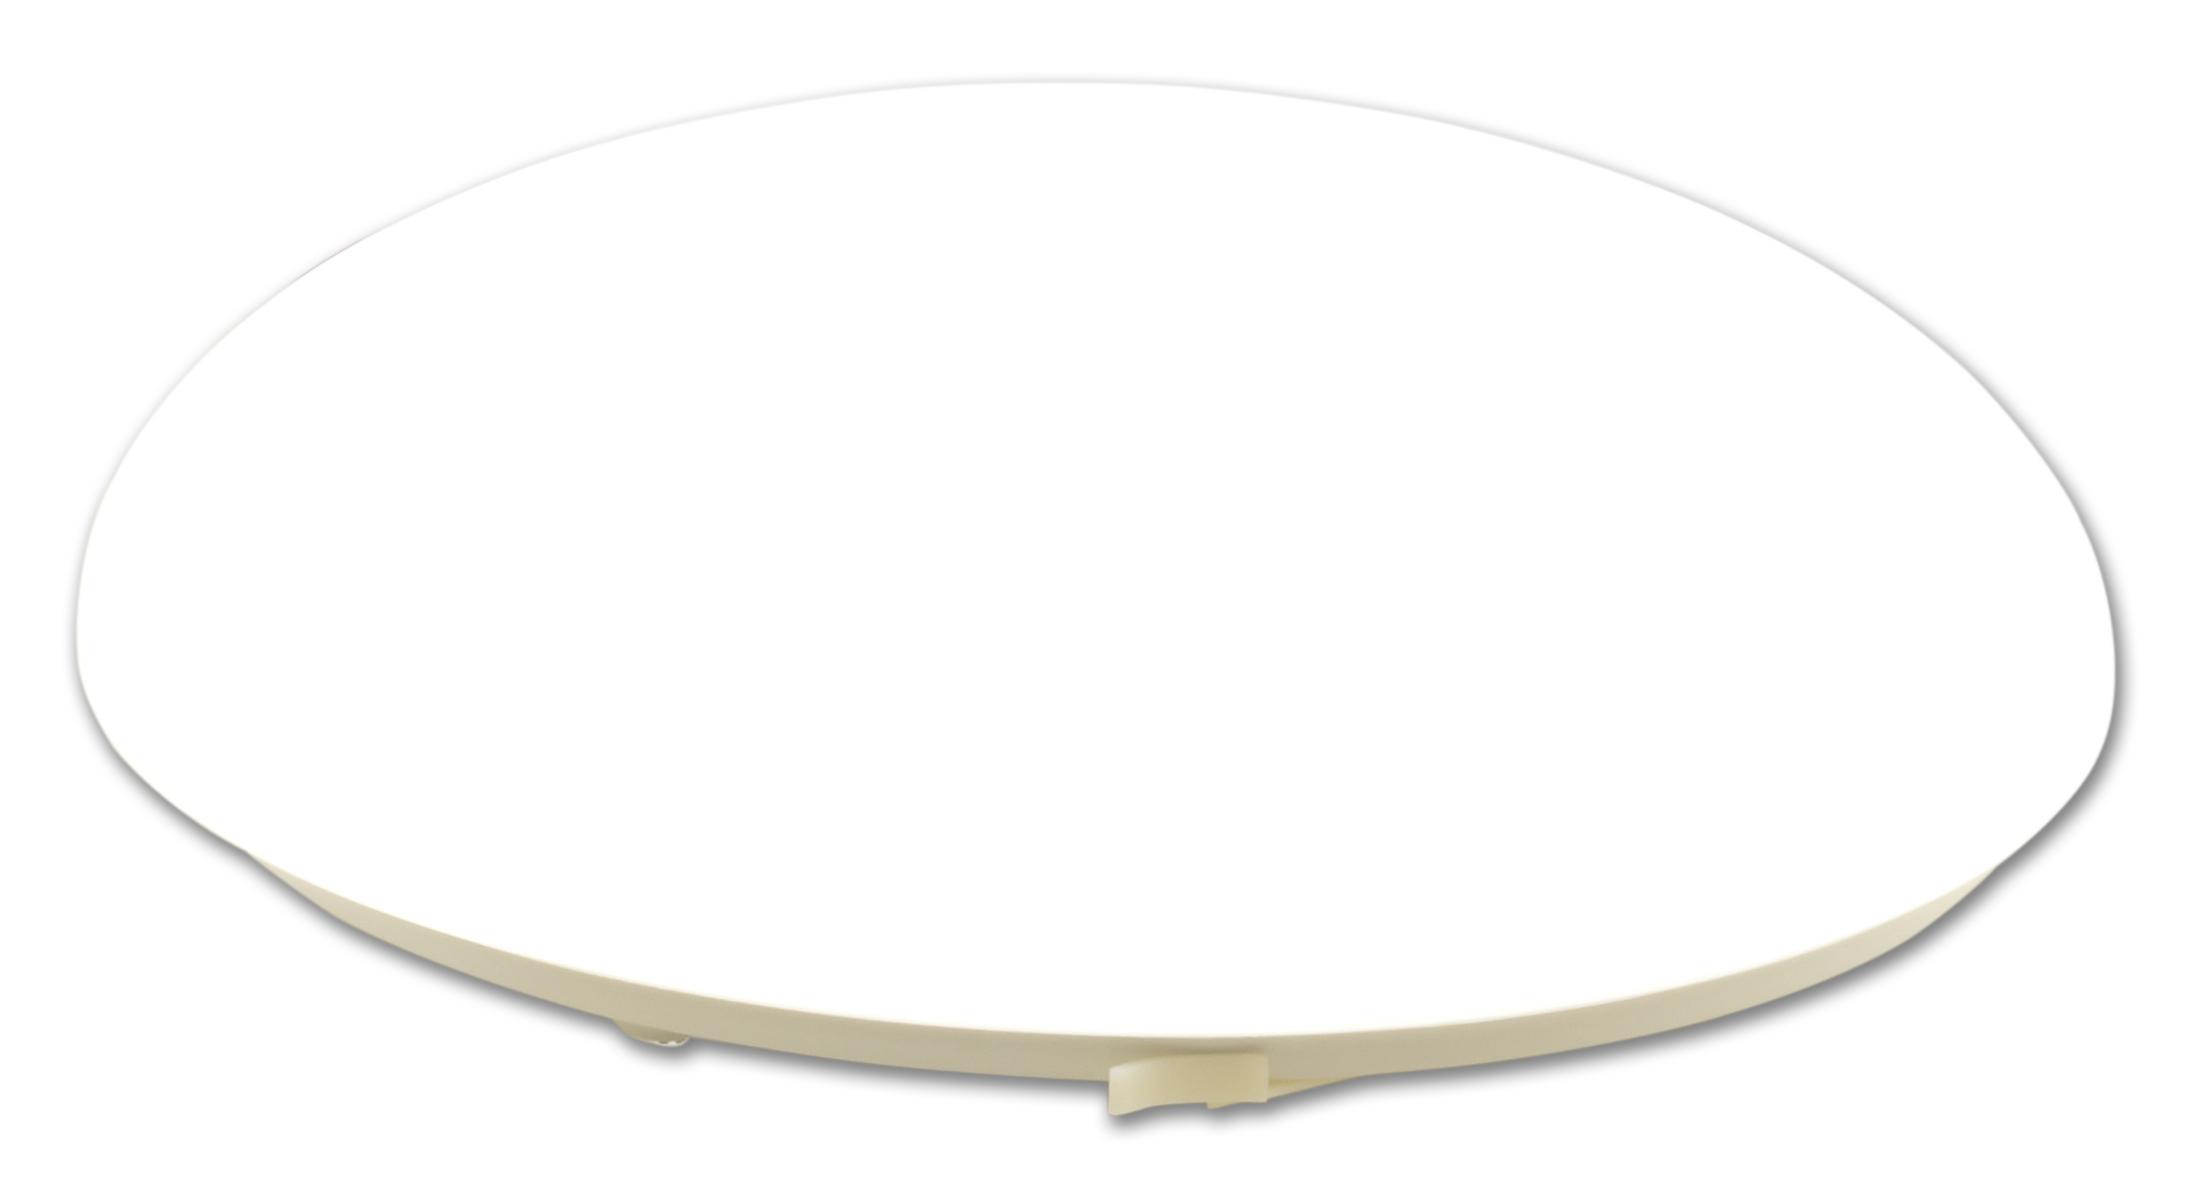 1 Stk Venus 300 LED Decken- & Wandleuchte, 17W, 3000K, IP44 RA 80+ LIDW300102